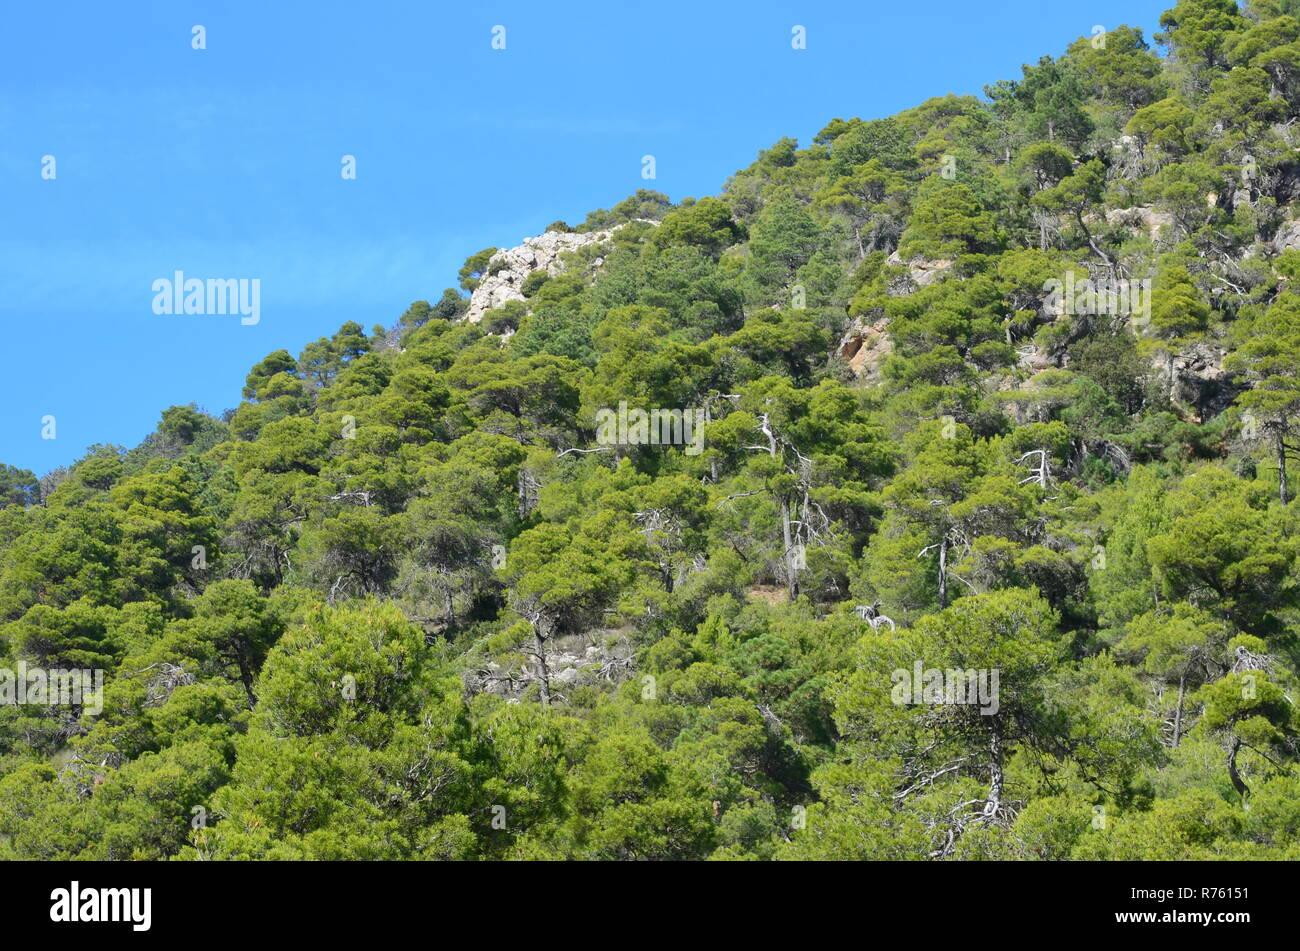 Aleppo pine Pinus halepensis forests in Sierra Espuña massif, Murcia (South-eastern Spain) - Stock Image